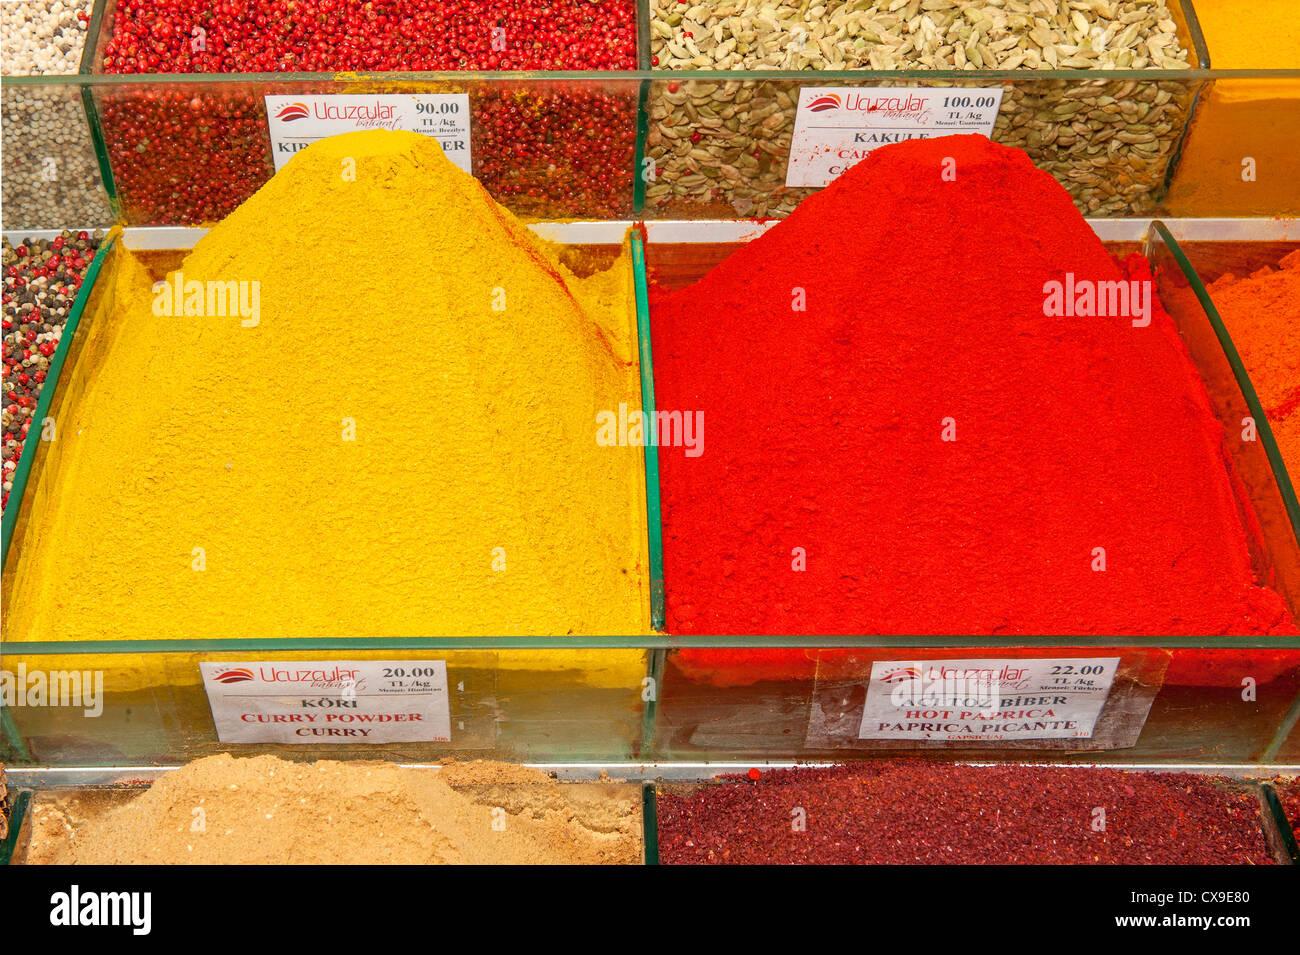 Spices, Egyptian bazaar, Istanbul, Turkey - Stock Image